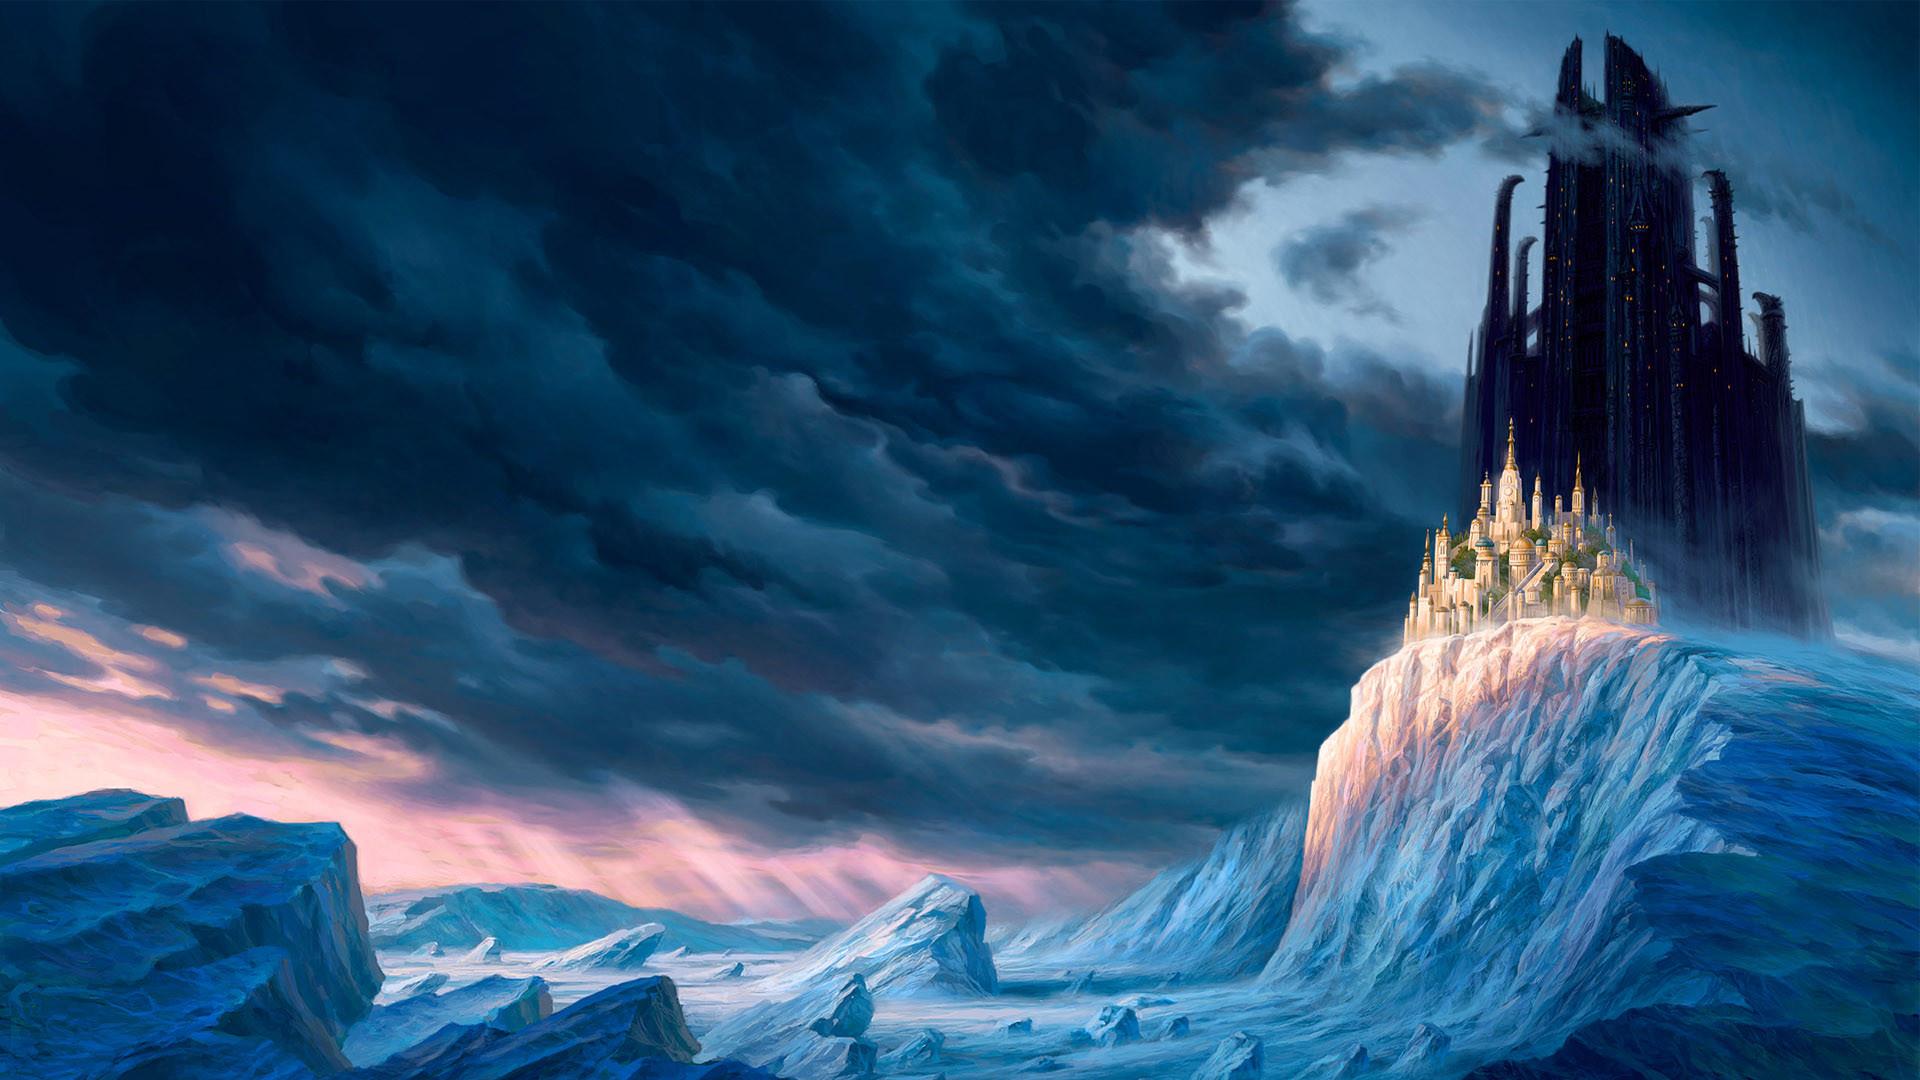 ice castle wallpaper 70 images